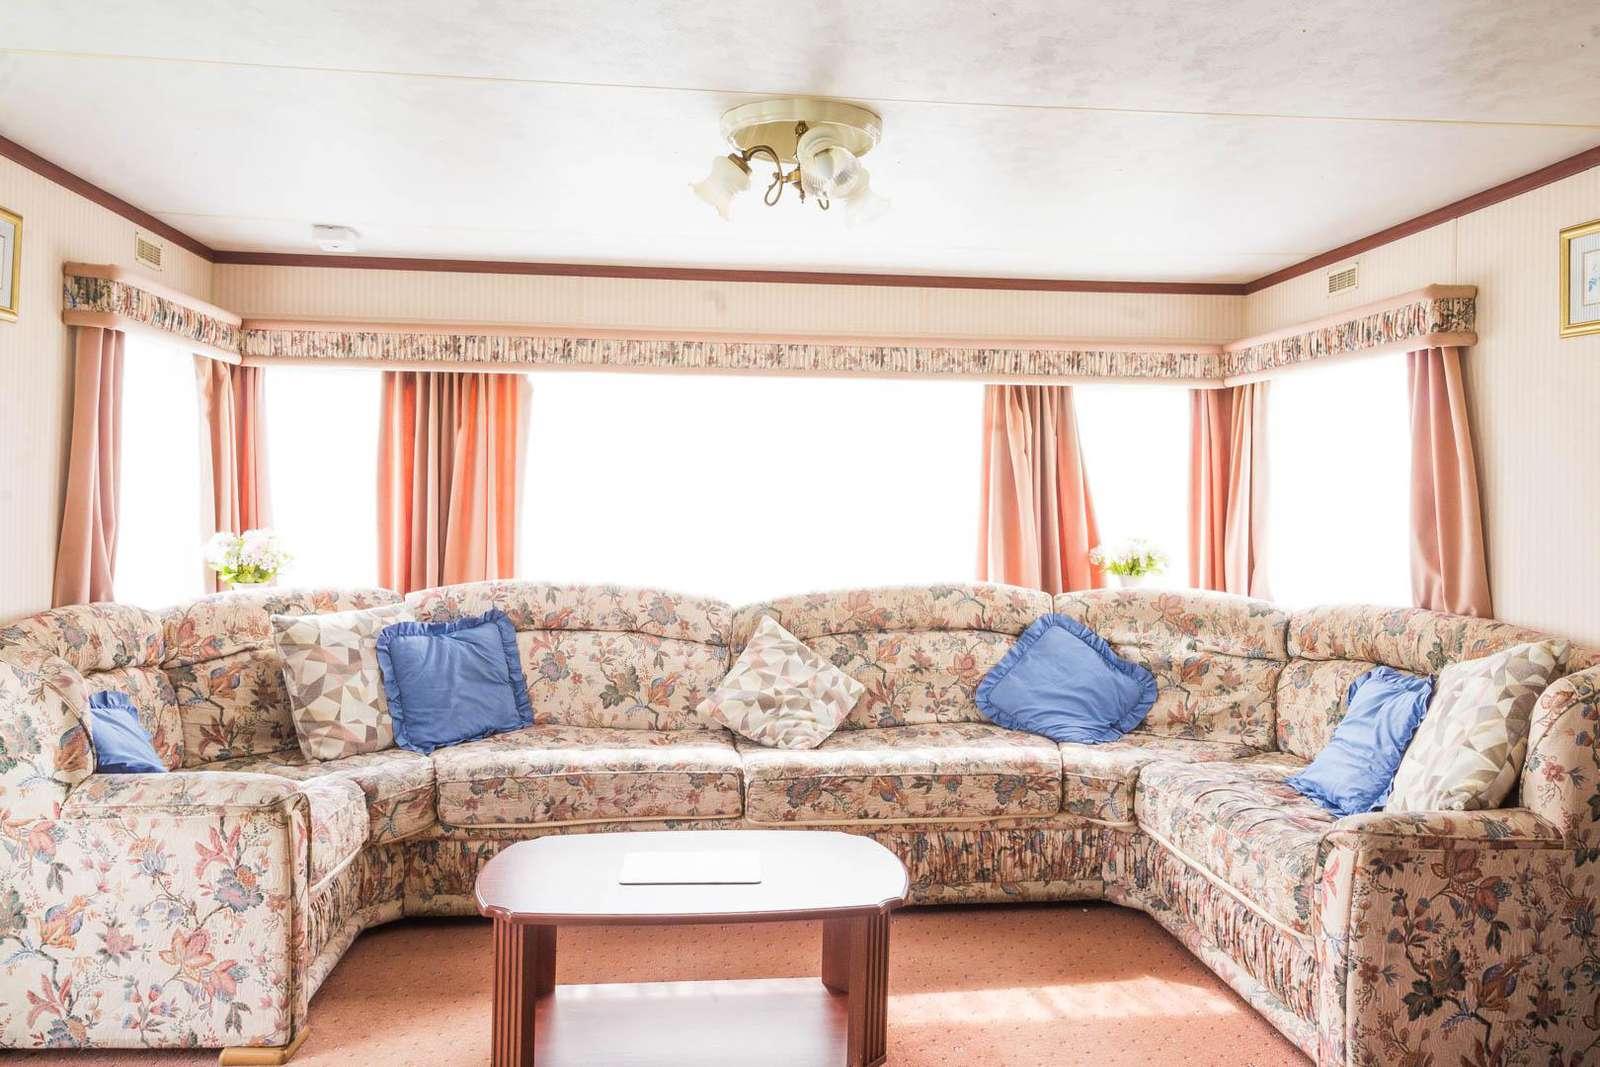 50020F – Fulmar 20 California Cliffs, 3 bed, 8 berth caravan. Sapphire rated - property